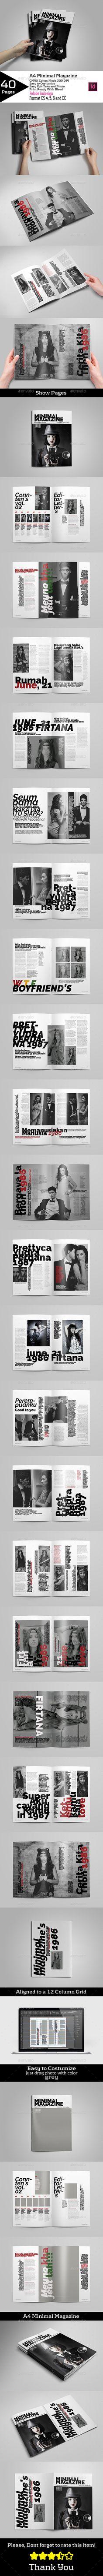 A4 Minimal Magazine Vol.2 - Magazines Print Templates